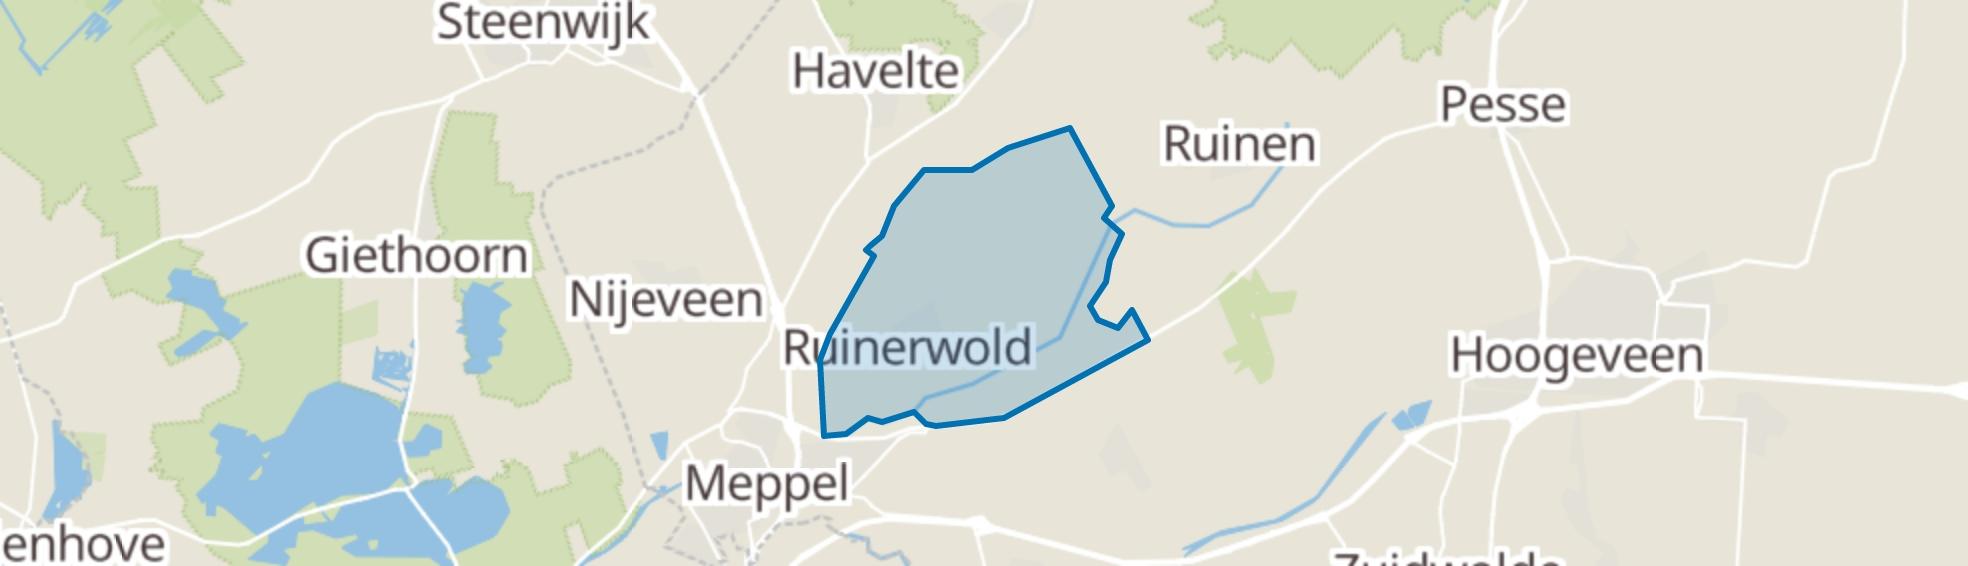 Ruinerwold map